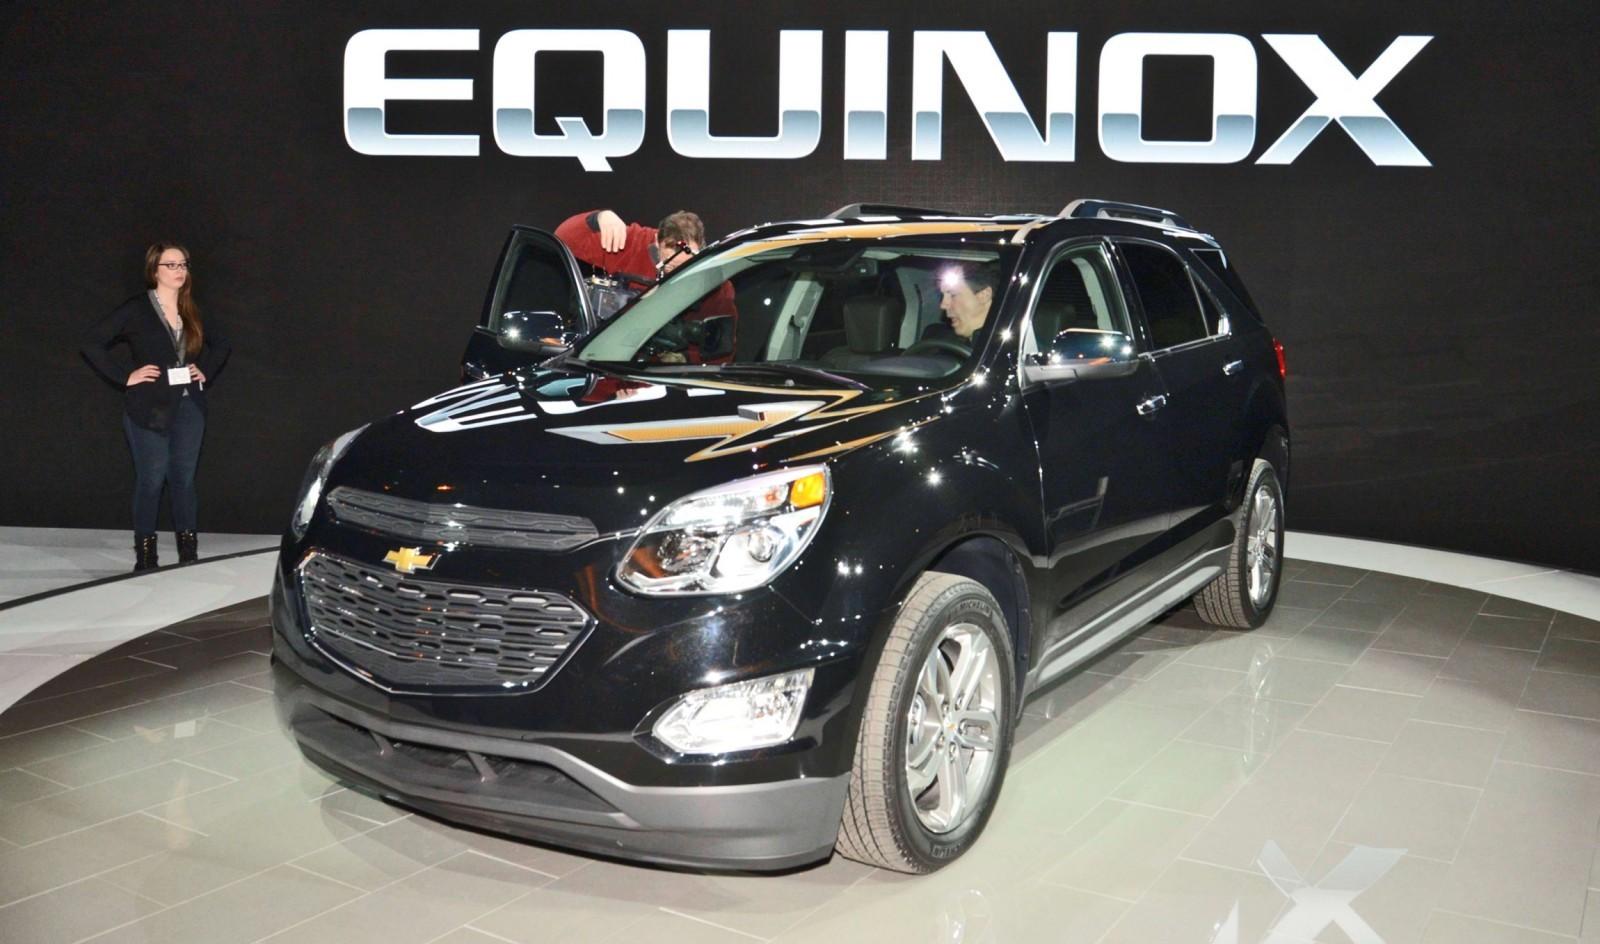 2015 equinox off road test autos post. Black Bedroom Furniture Sets. Home Design Ideas